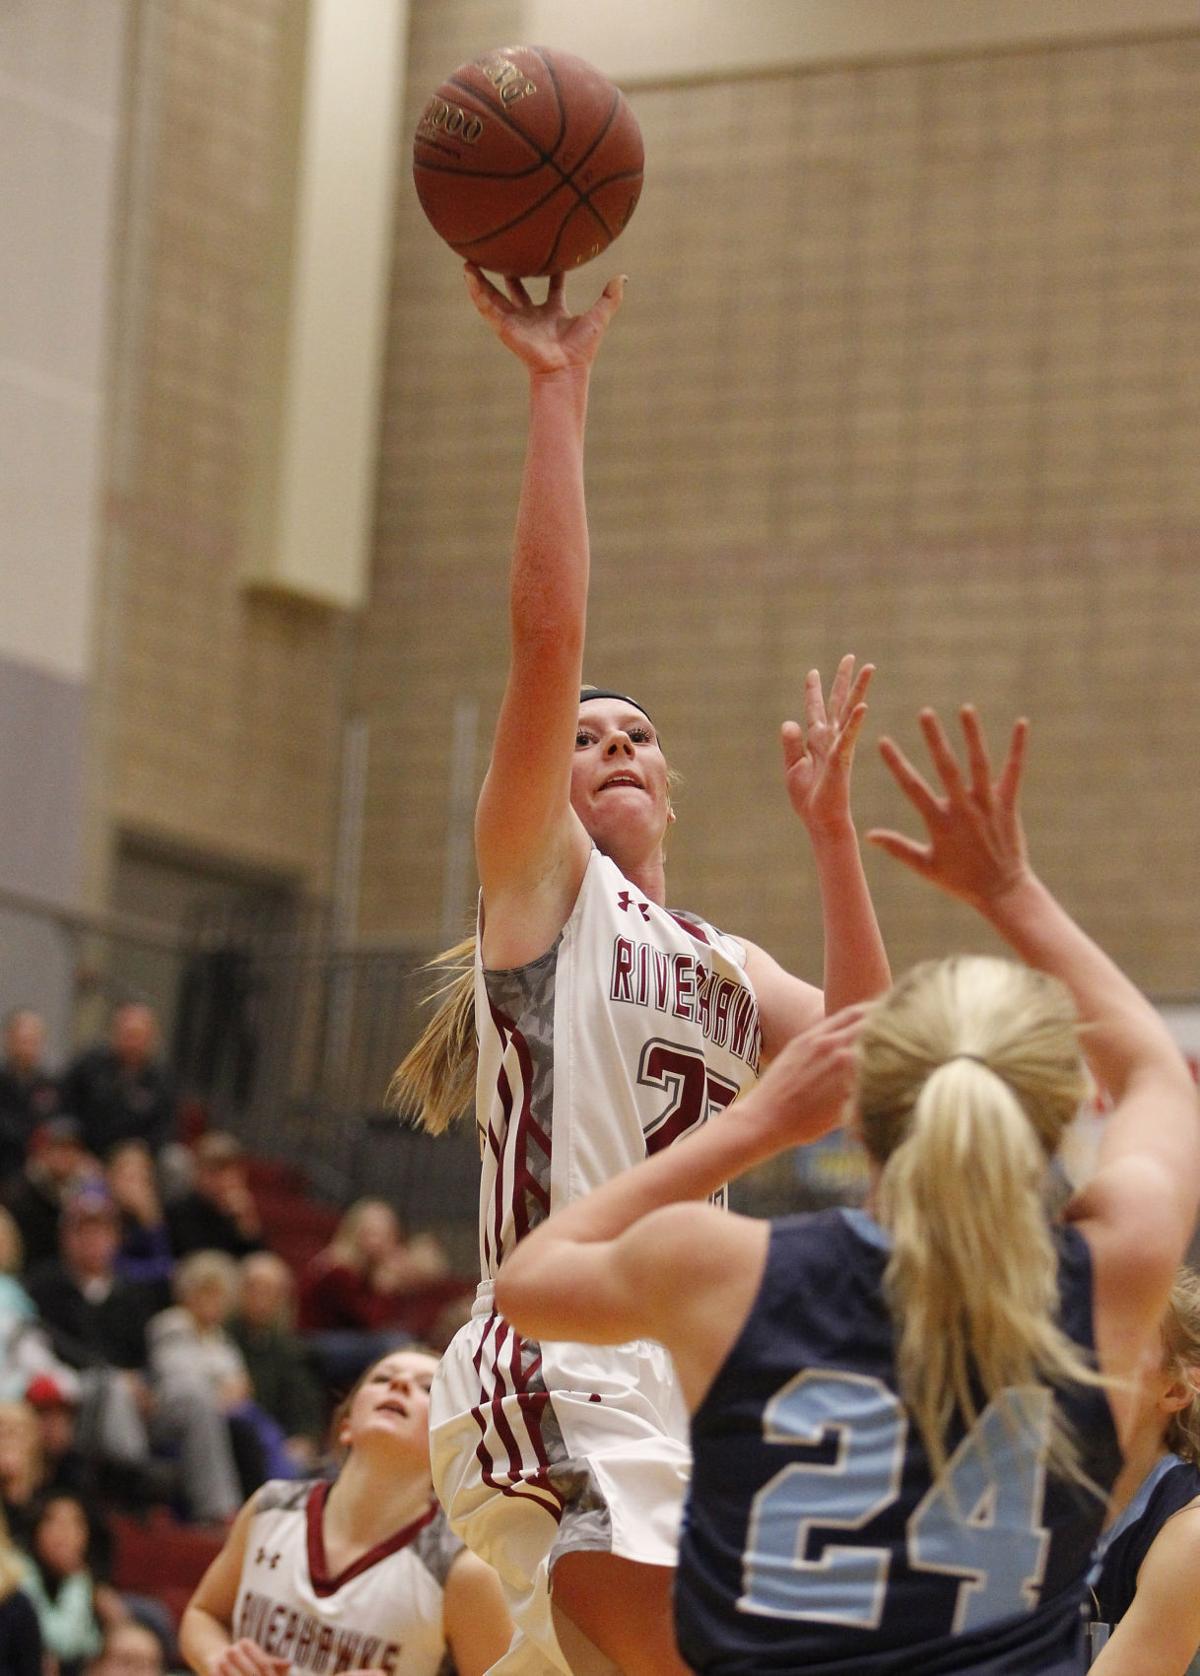 Girls Basketball - Twin Falls Vs. Canyon Ridge